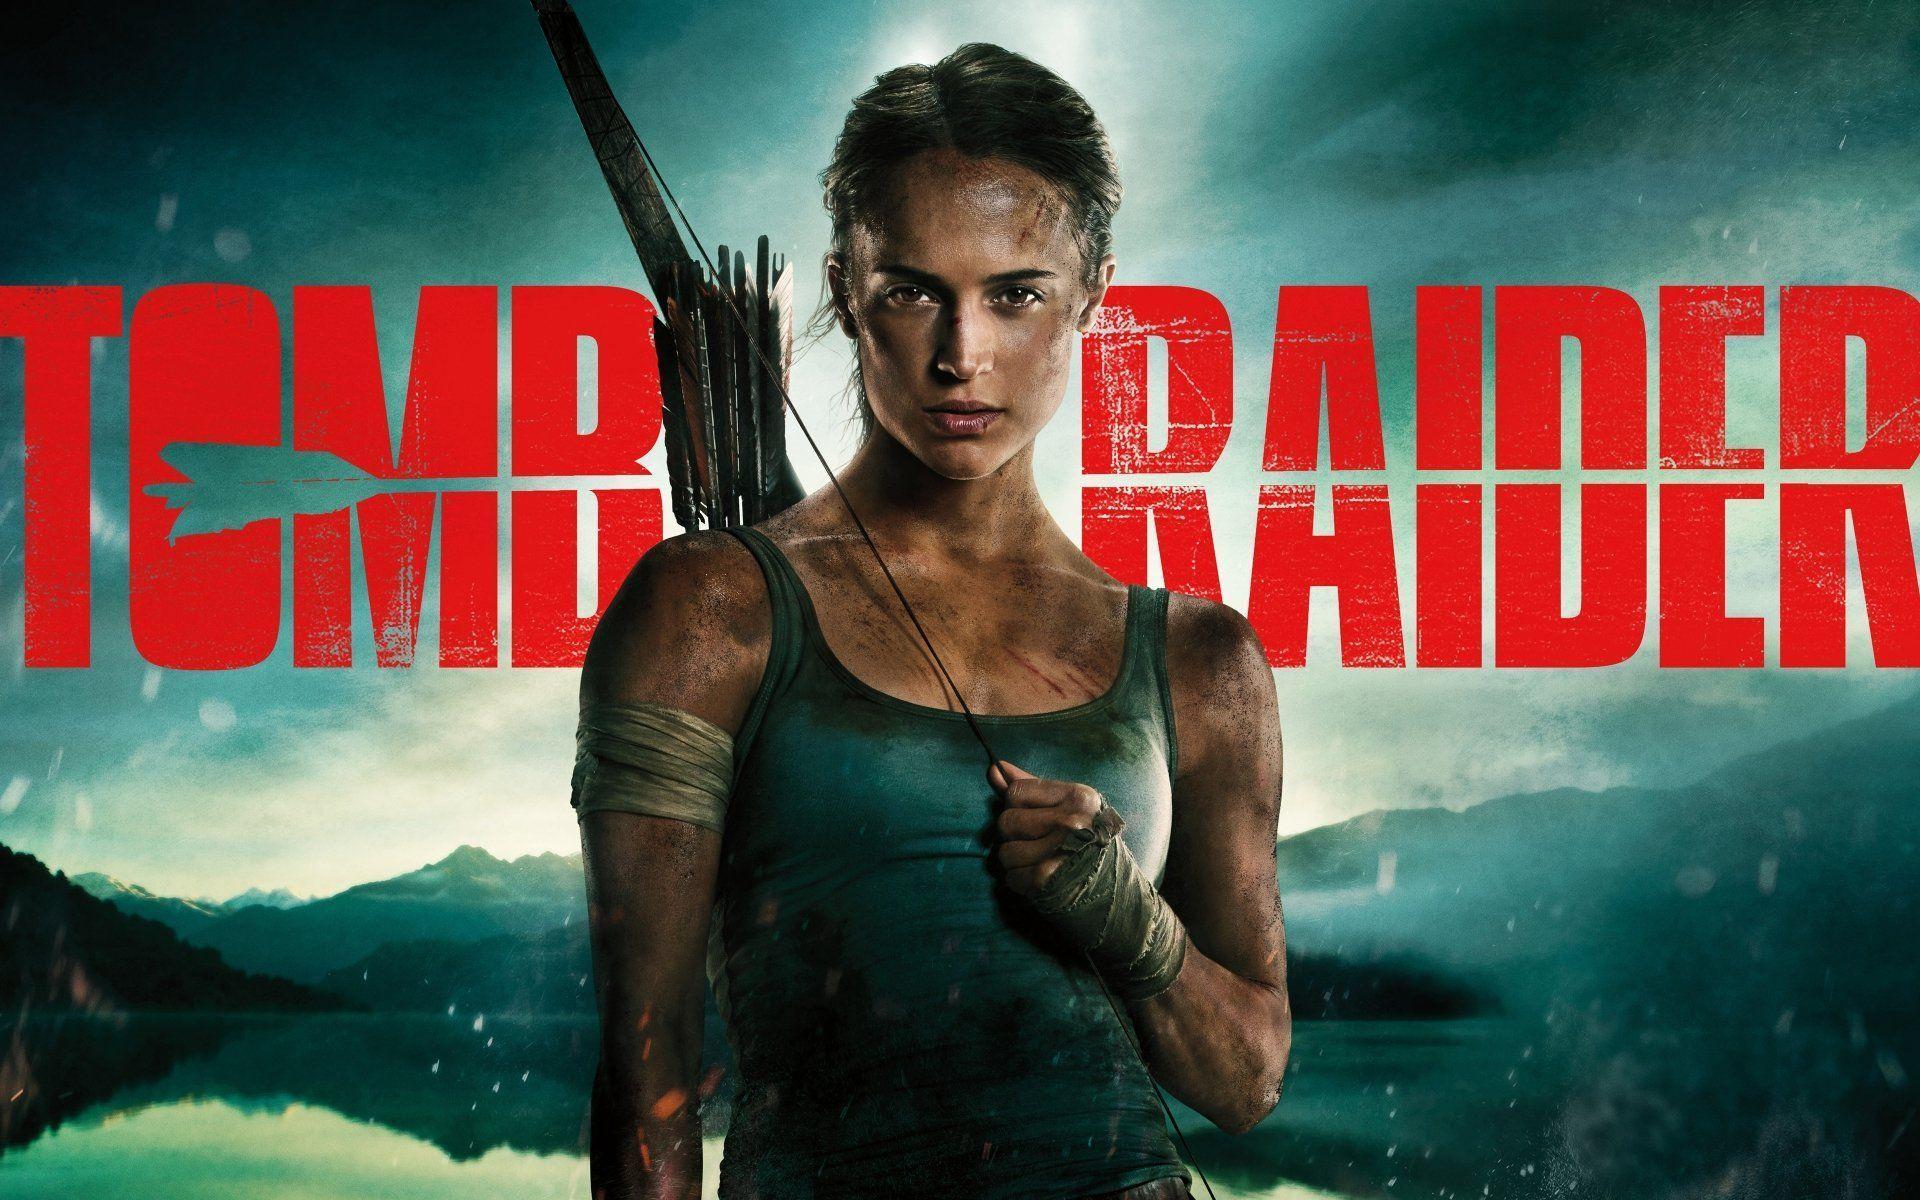 Tomb Raider Movie Wallpapers Top Free Tomb Raider Movie